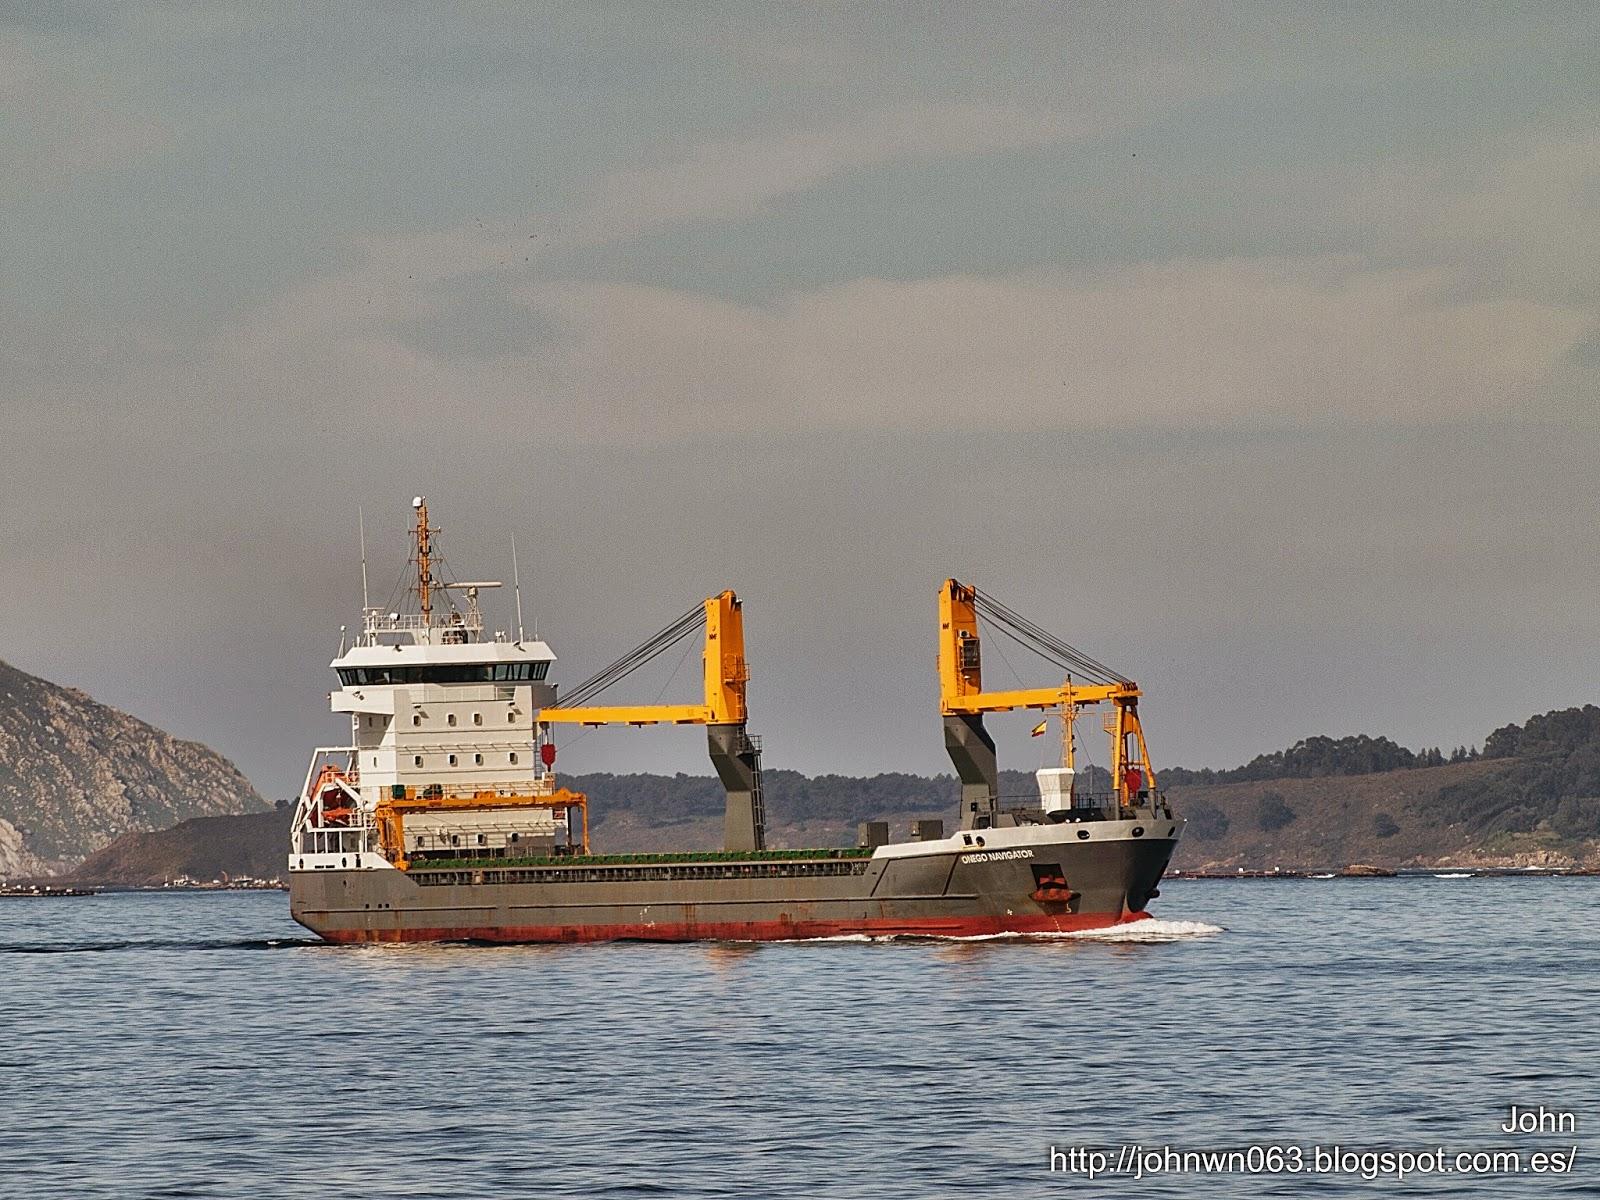 fotos de barcos, imagenes de barcos, onego navigator, carga general, vigo